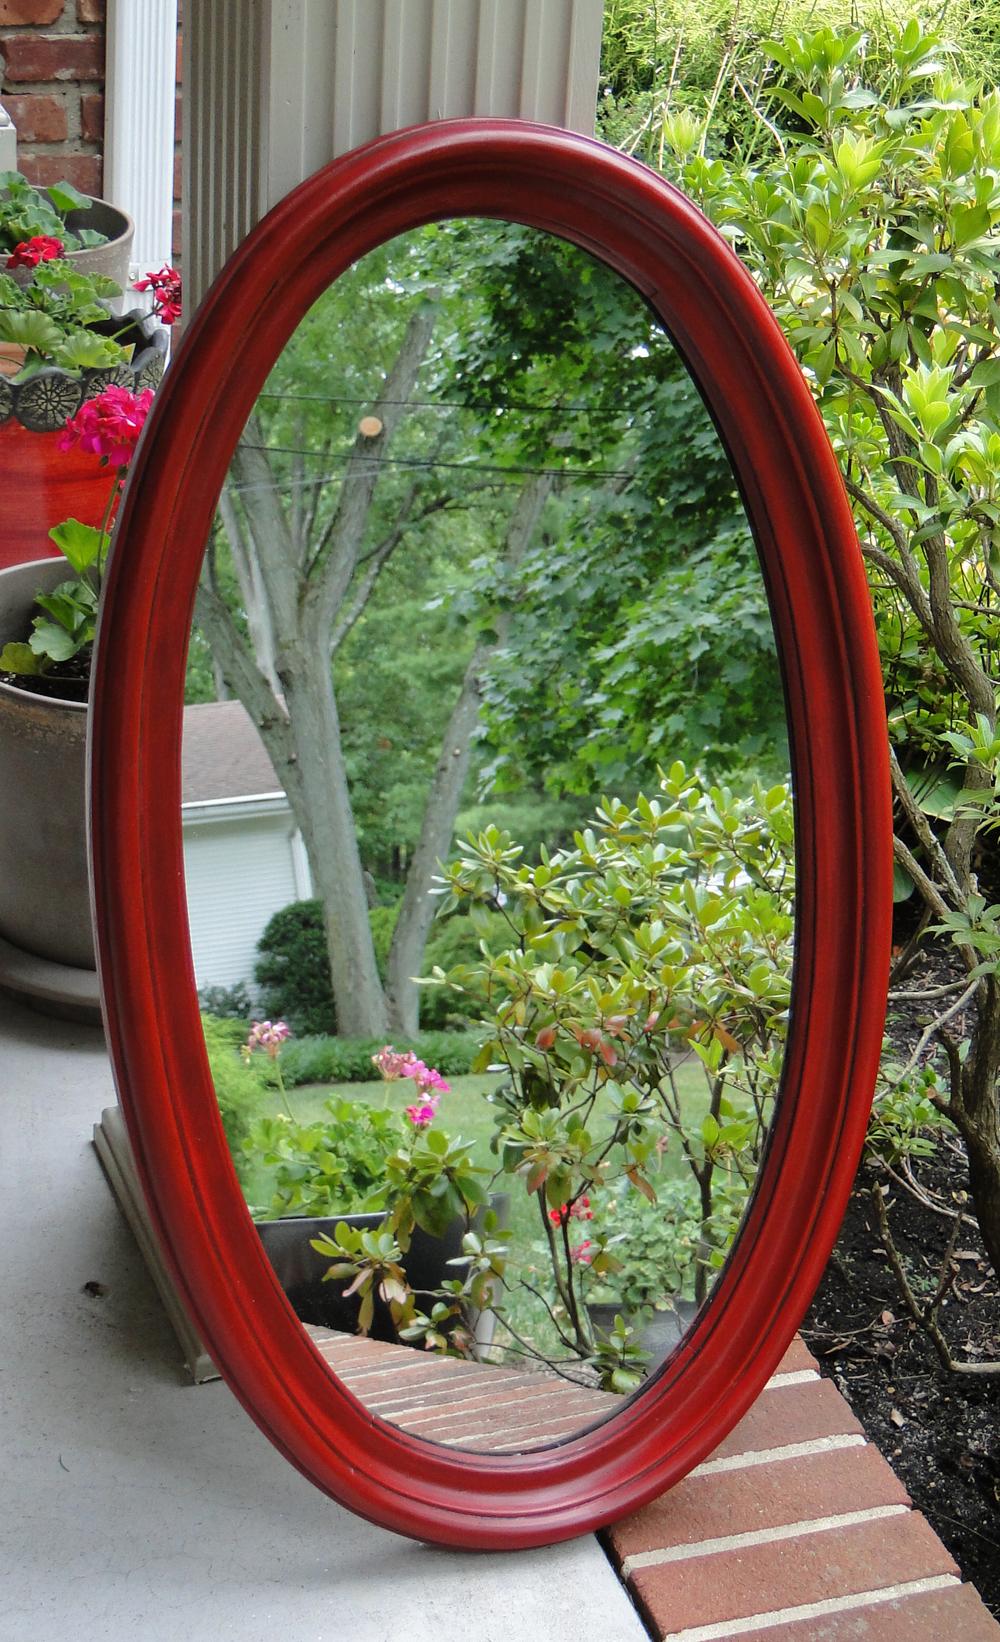 After mirror standing porch.JPG